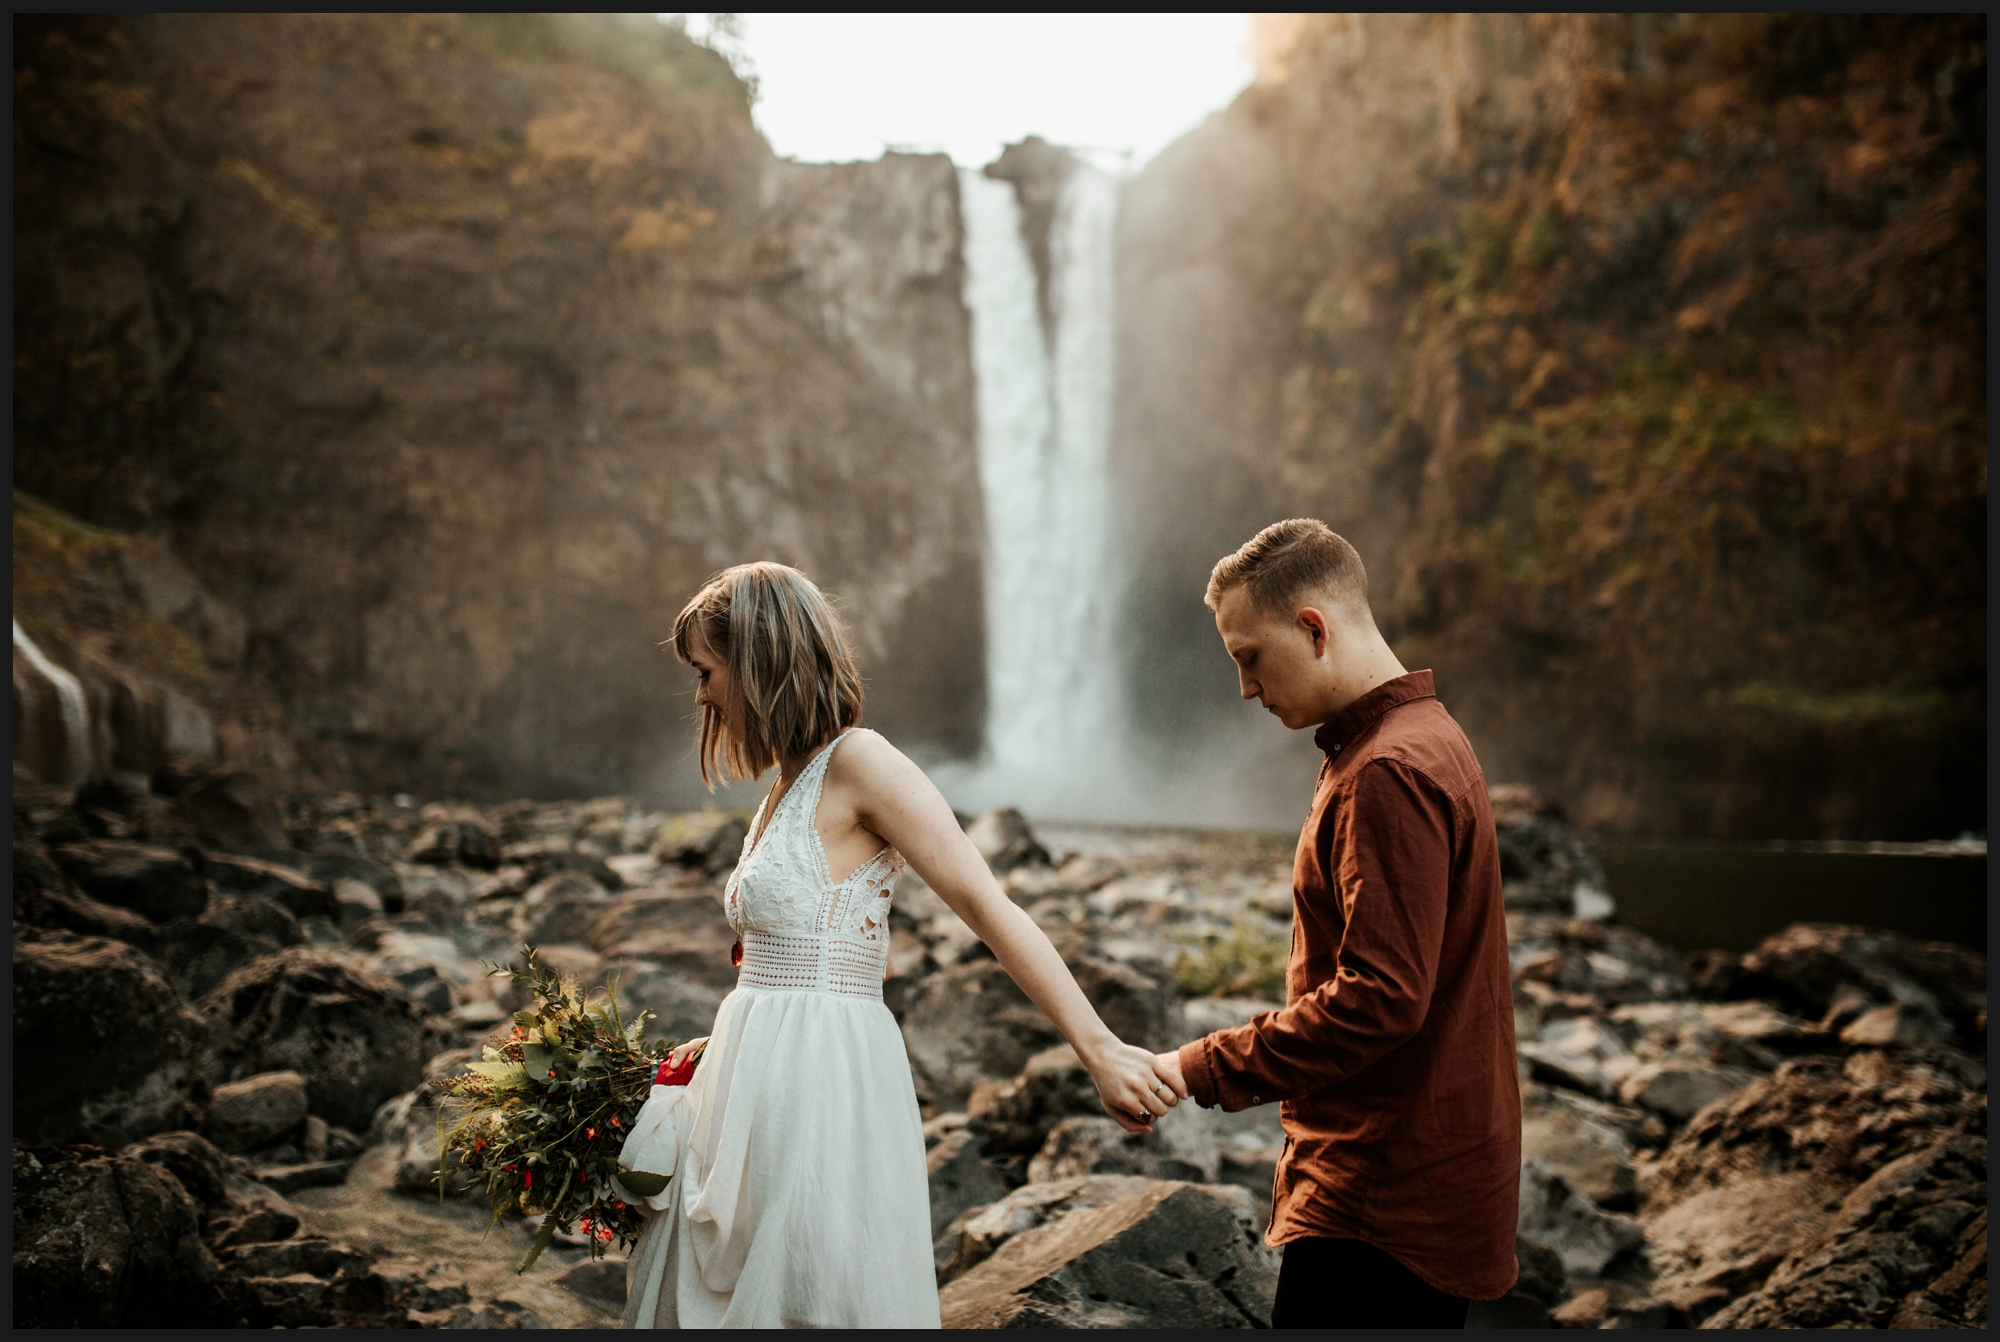 Orlando-Wedding-Photographer-destination-wedding-photographer-florida-wedding-photographer-bohemian-wedding-photographer_0419.jpg